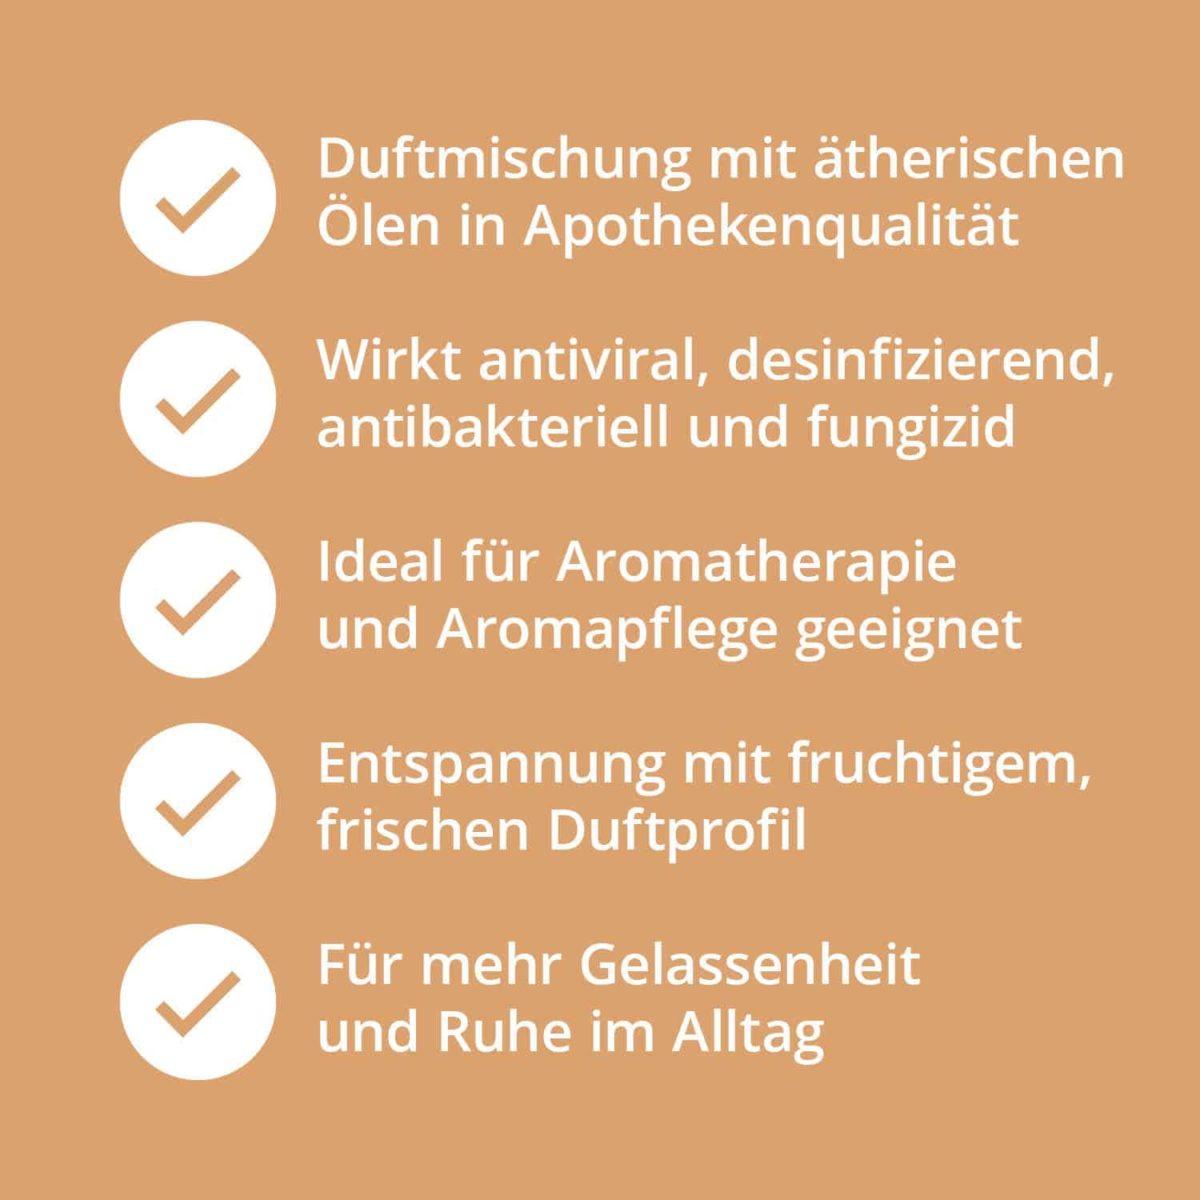 Casida Duftmischung Ruhe & Entspannung - 5 ml 17394517 PZN Apotheke Entspannung Aromatherapie Aromapflege Aromaschmuck Diffuser7